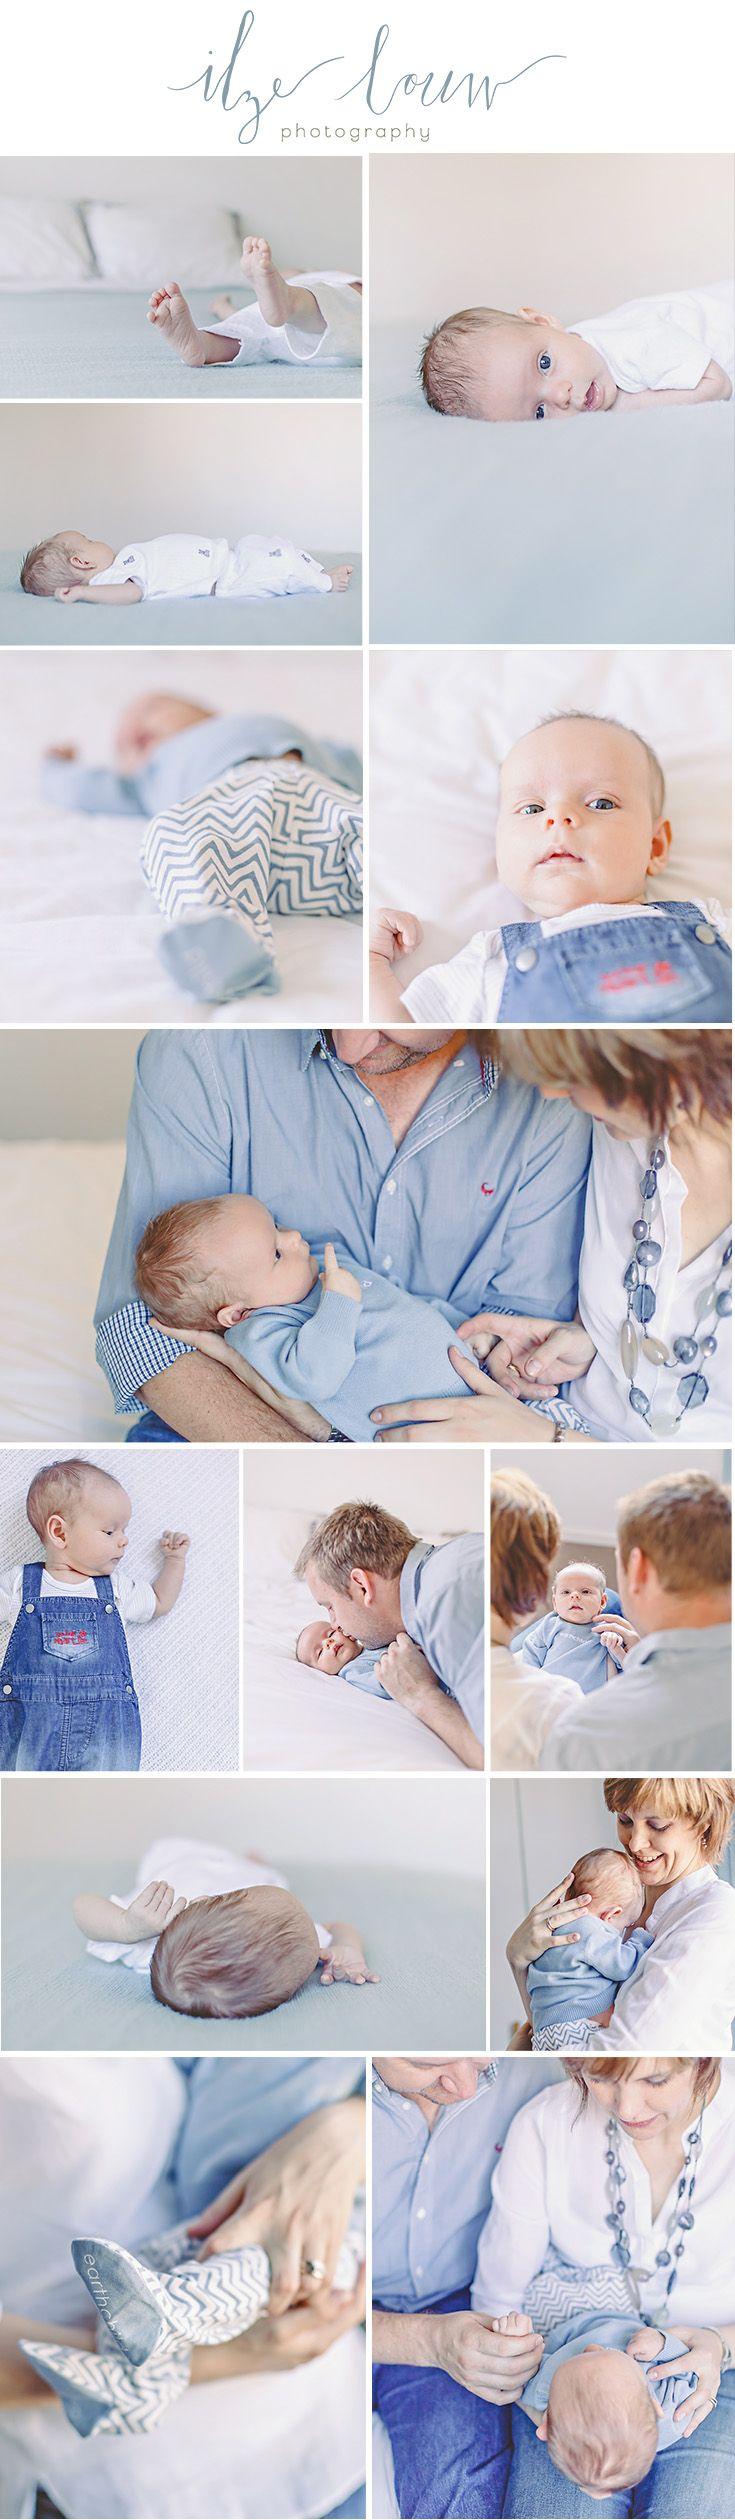 www.ilzelouw.co.za Lifestyle Baby Photographer, Overberg Photographer, Western Cape, South Africa #lifestyle #baby #newborn #photography